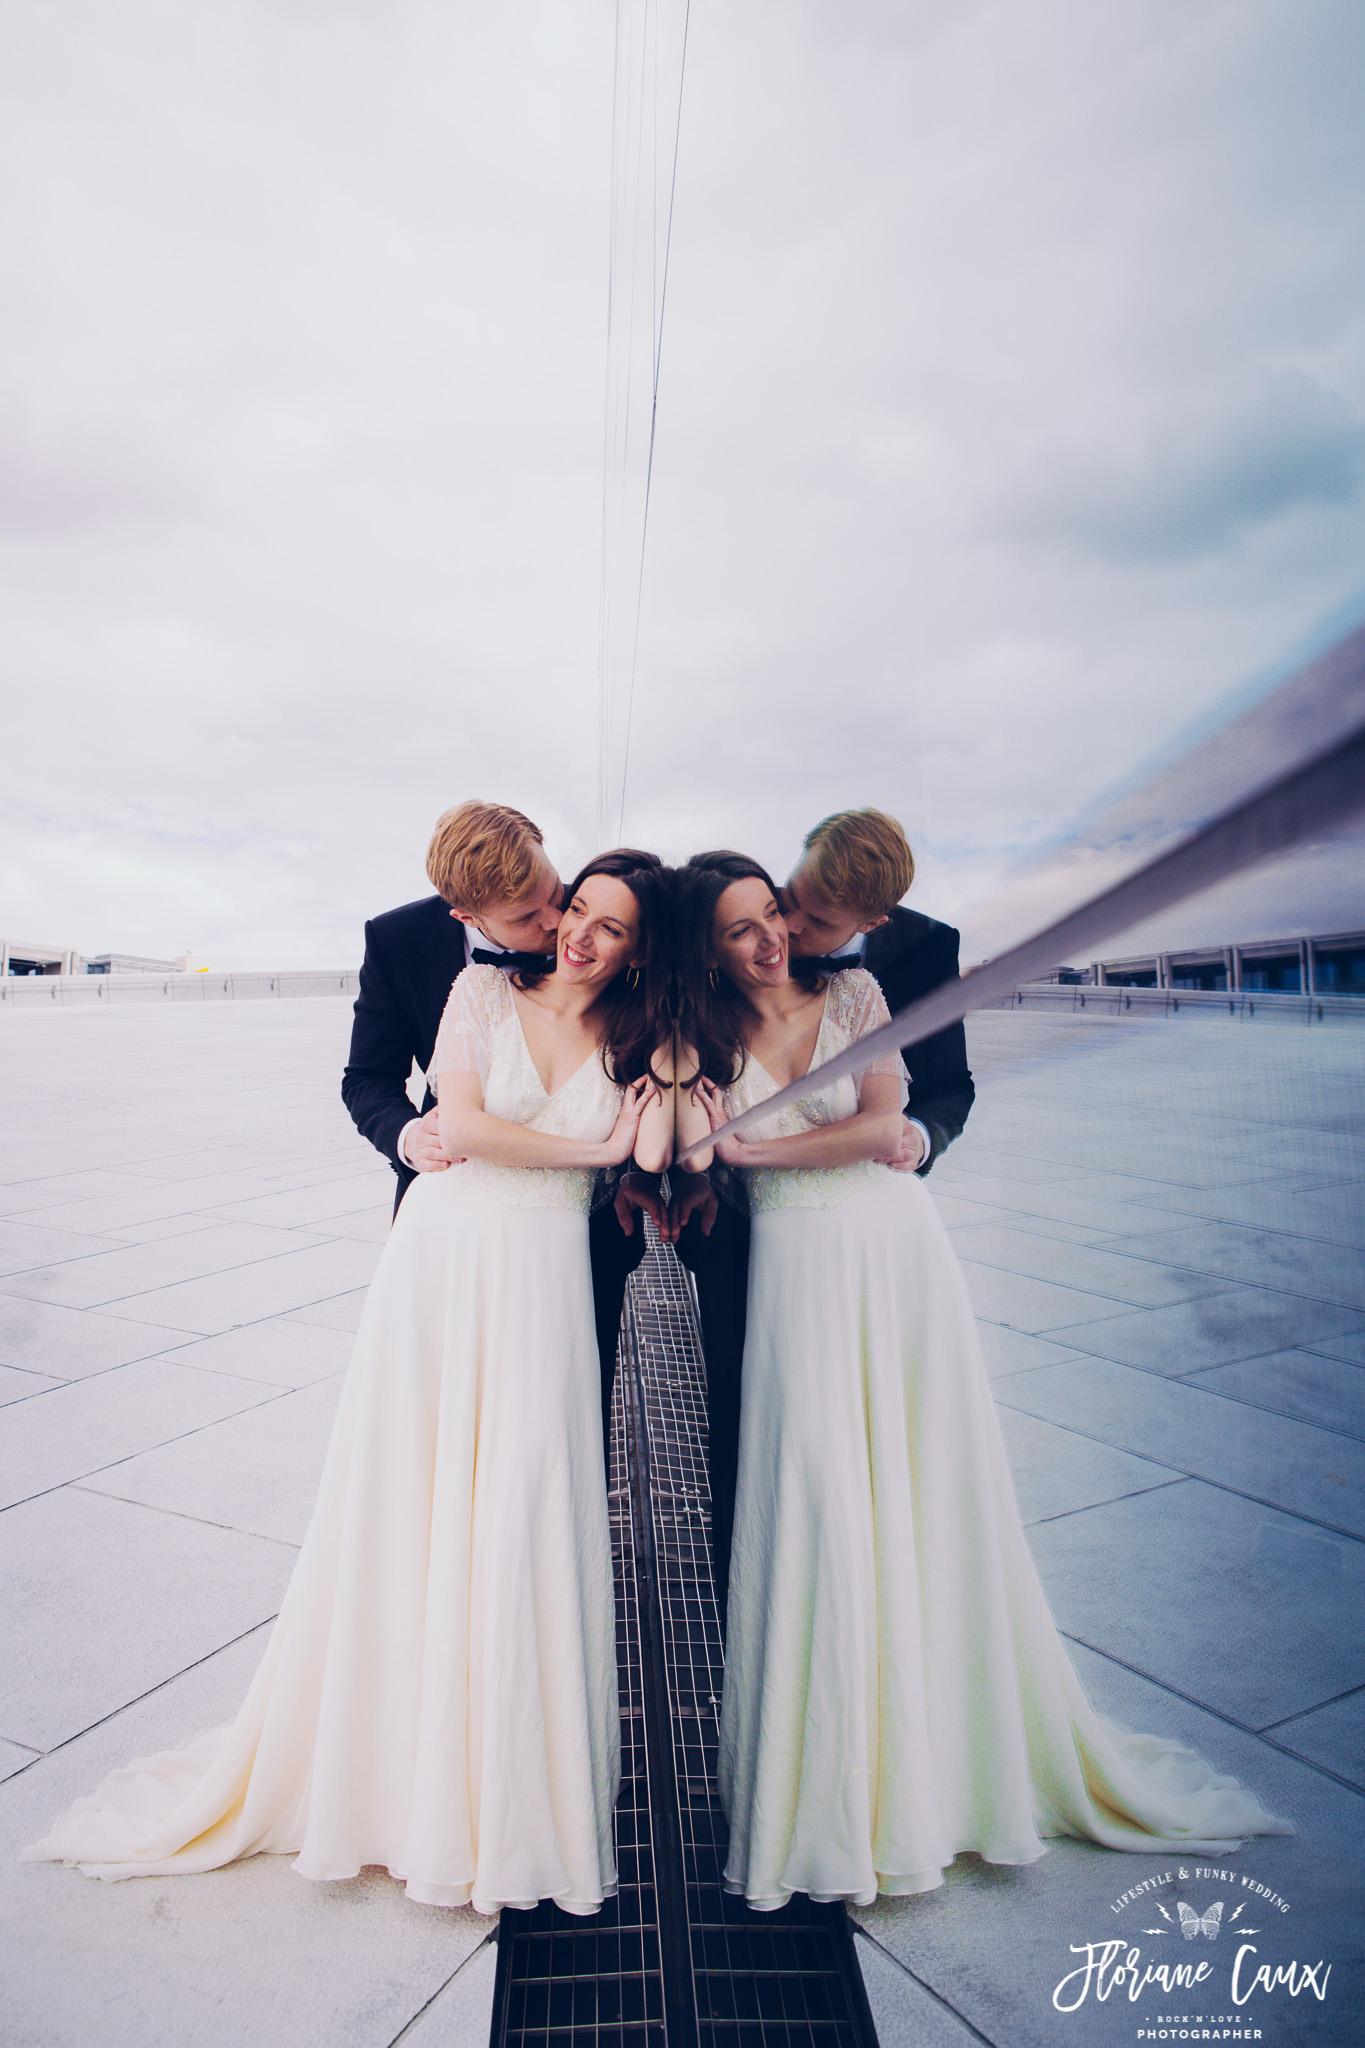 destination-wedding-photographer-oslo-norway-floriane-caux-60